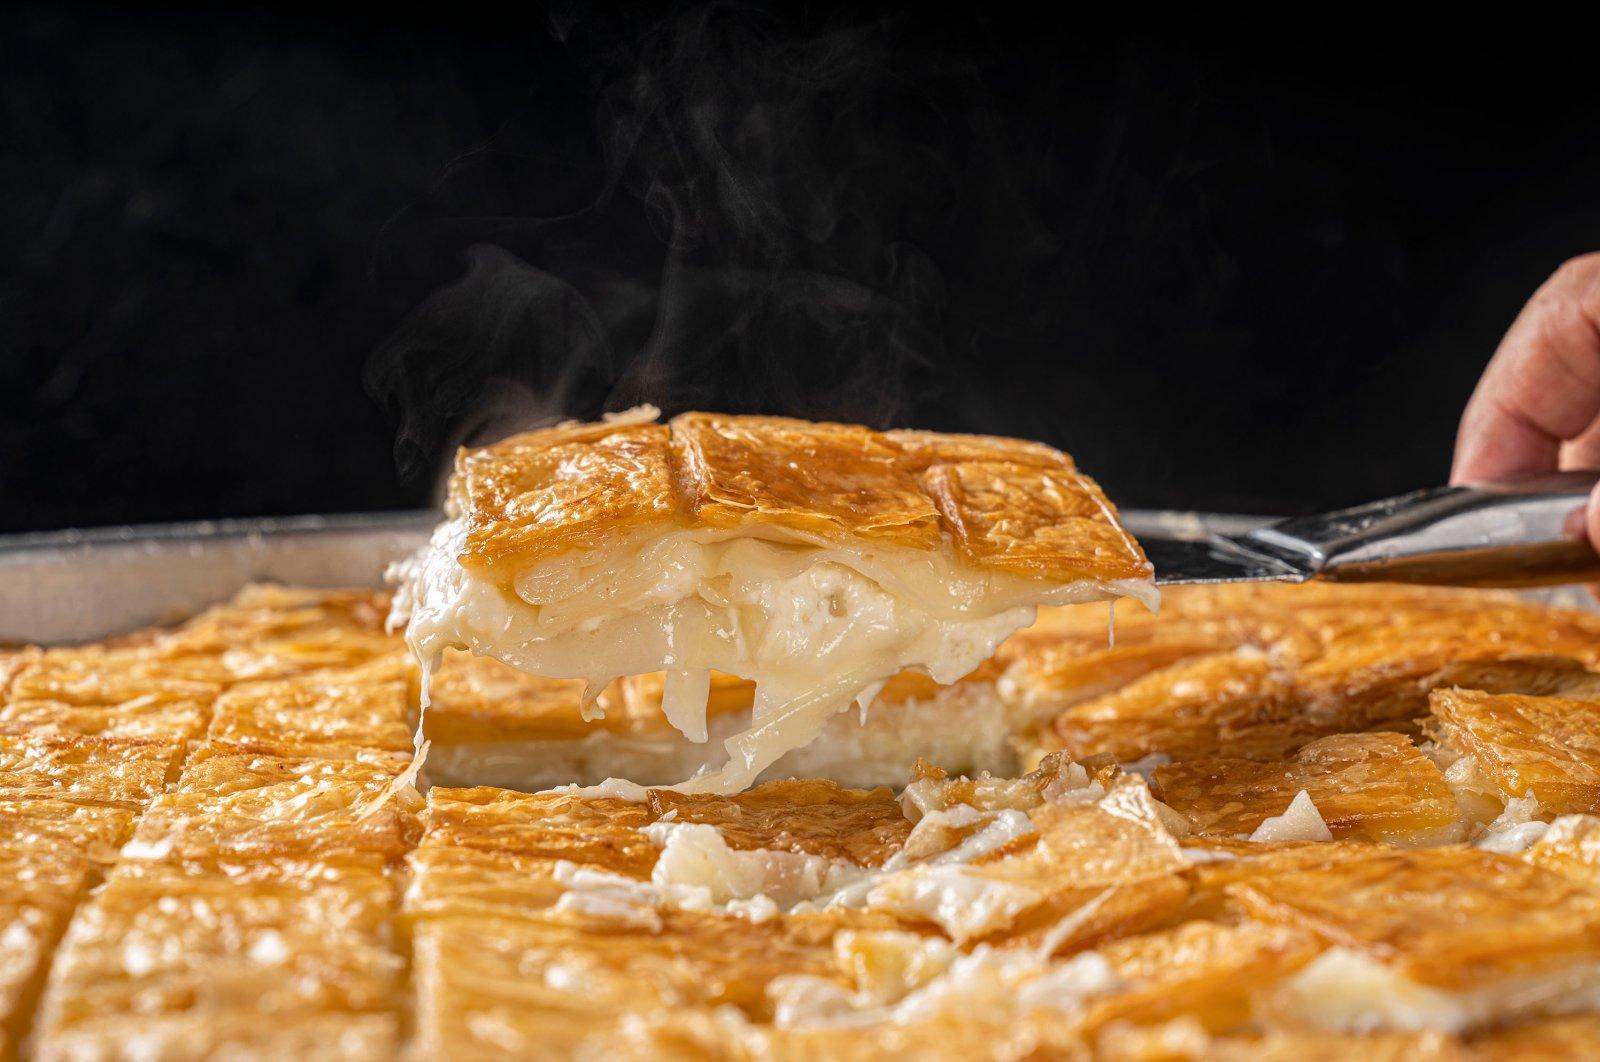 A tray of cheese-filled su börek. (Shutterstock Photo)